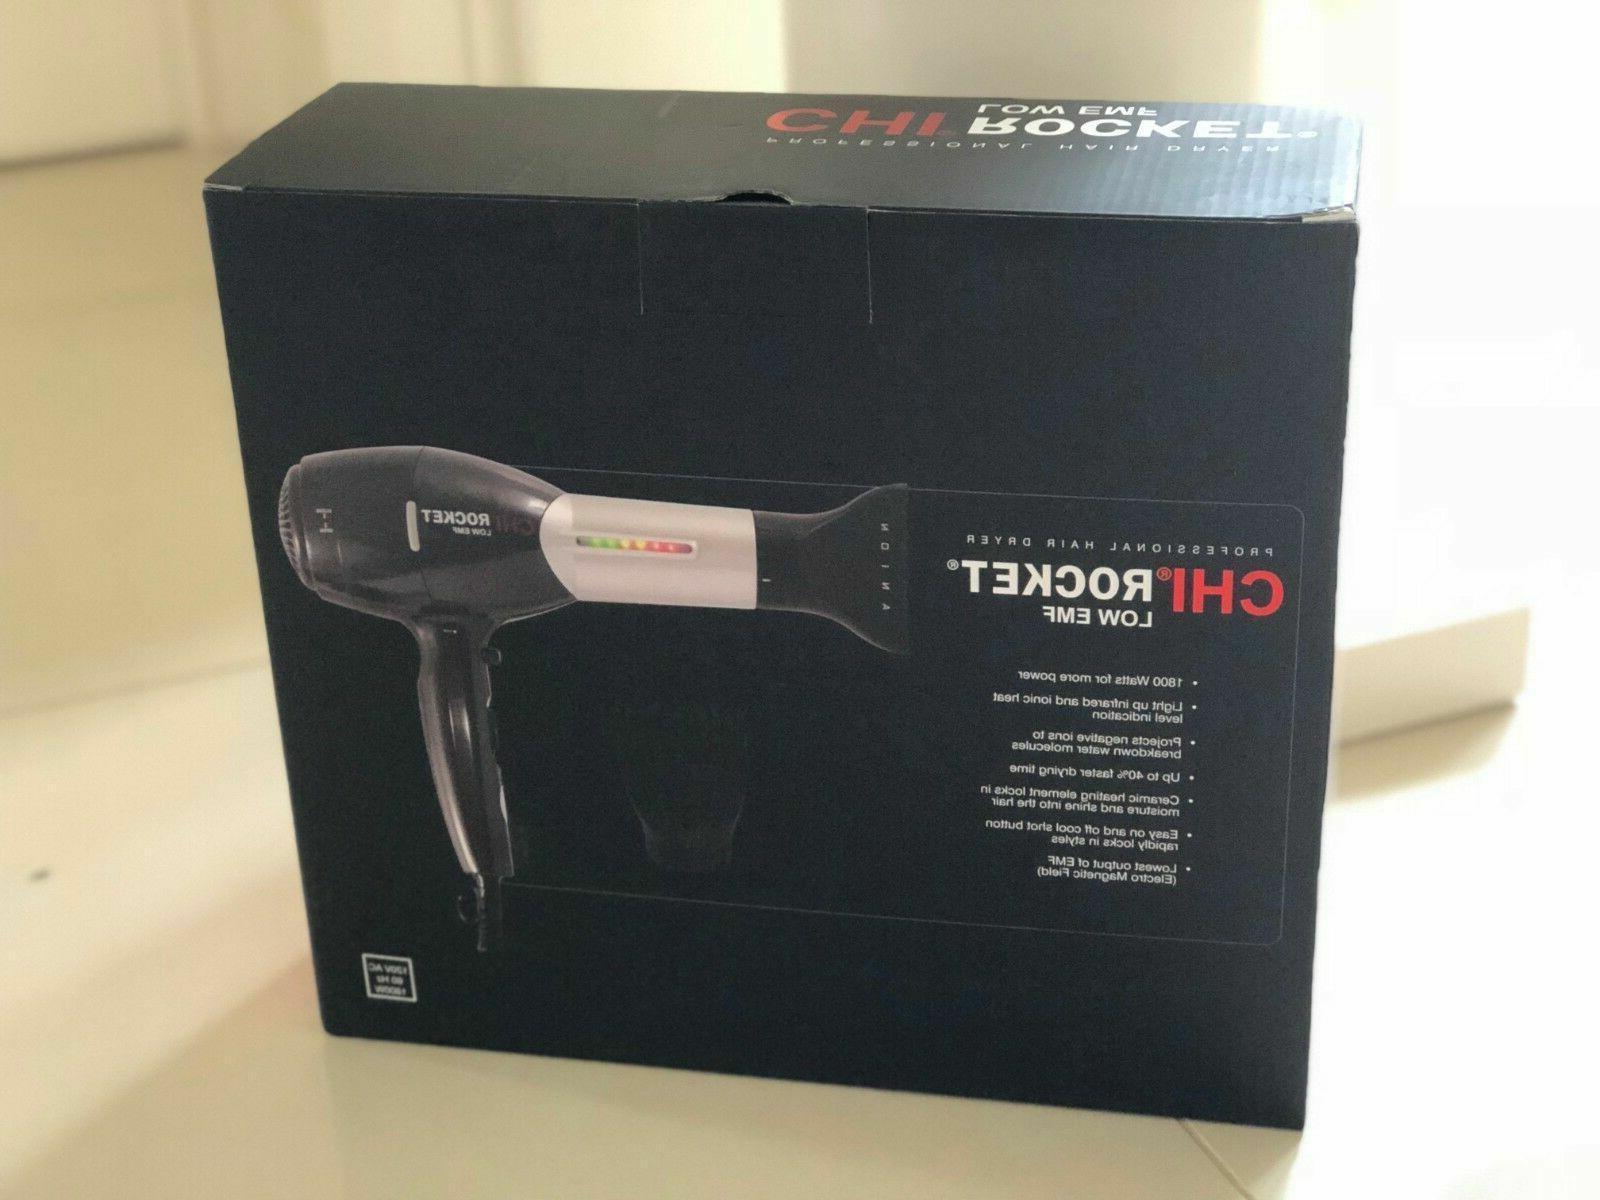 NIB CHI Rocket EMF Hair - WATTS Infrared &